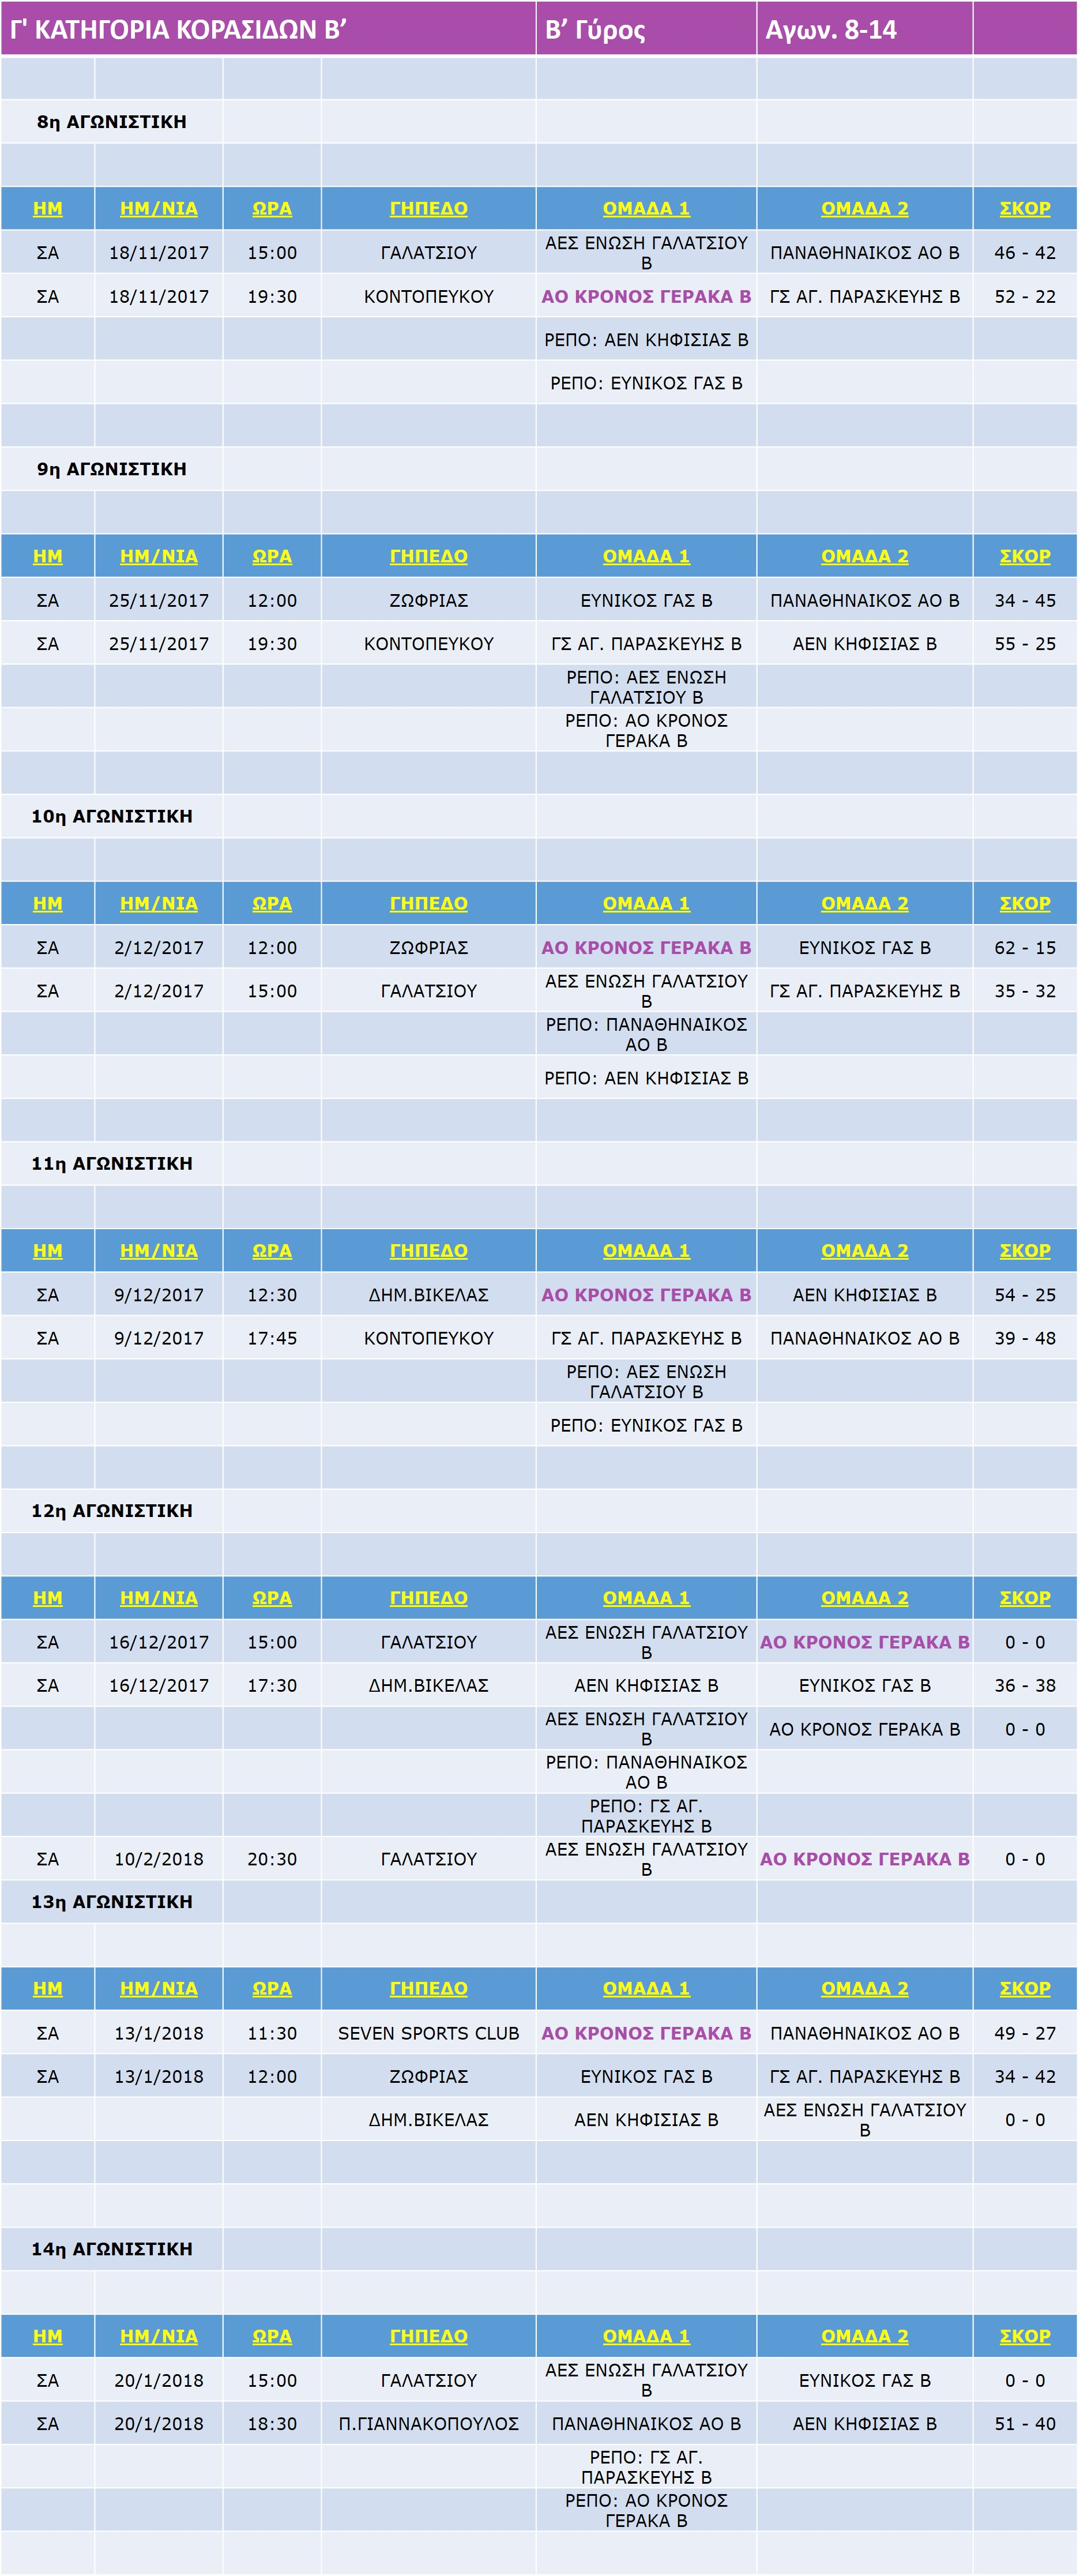 Korasides_Match_B_8-14-14